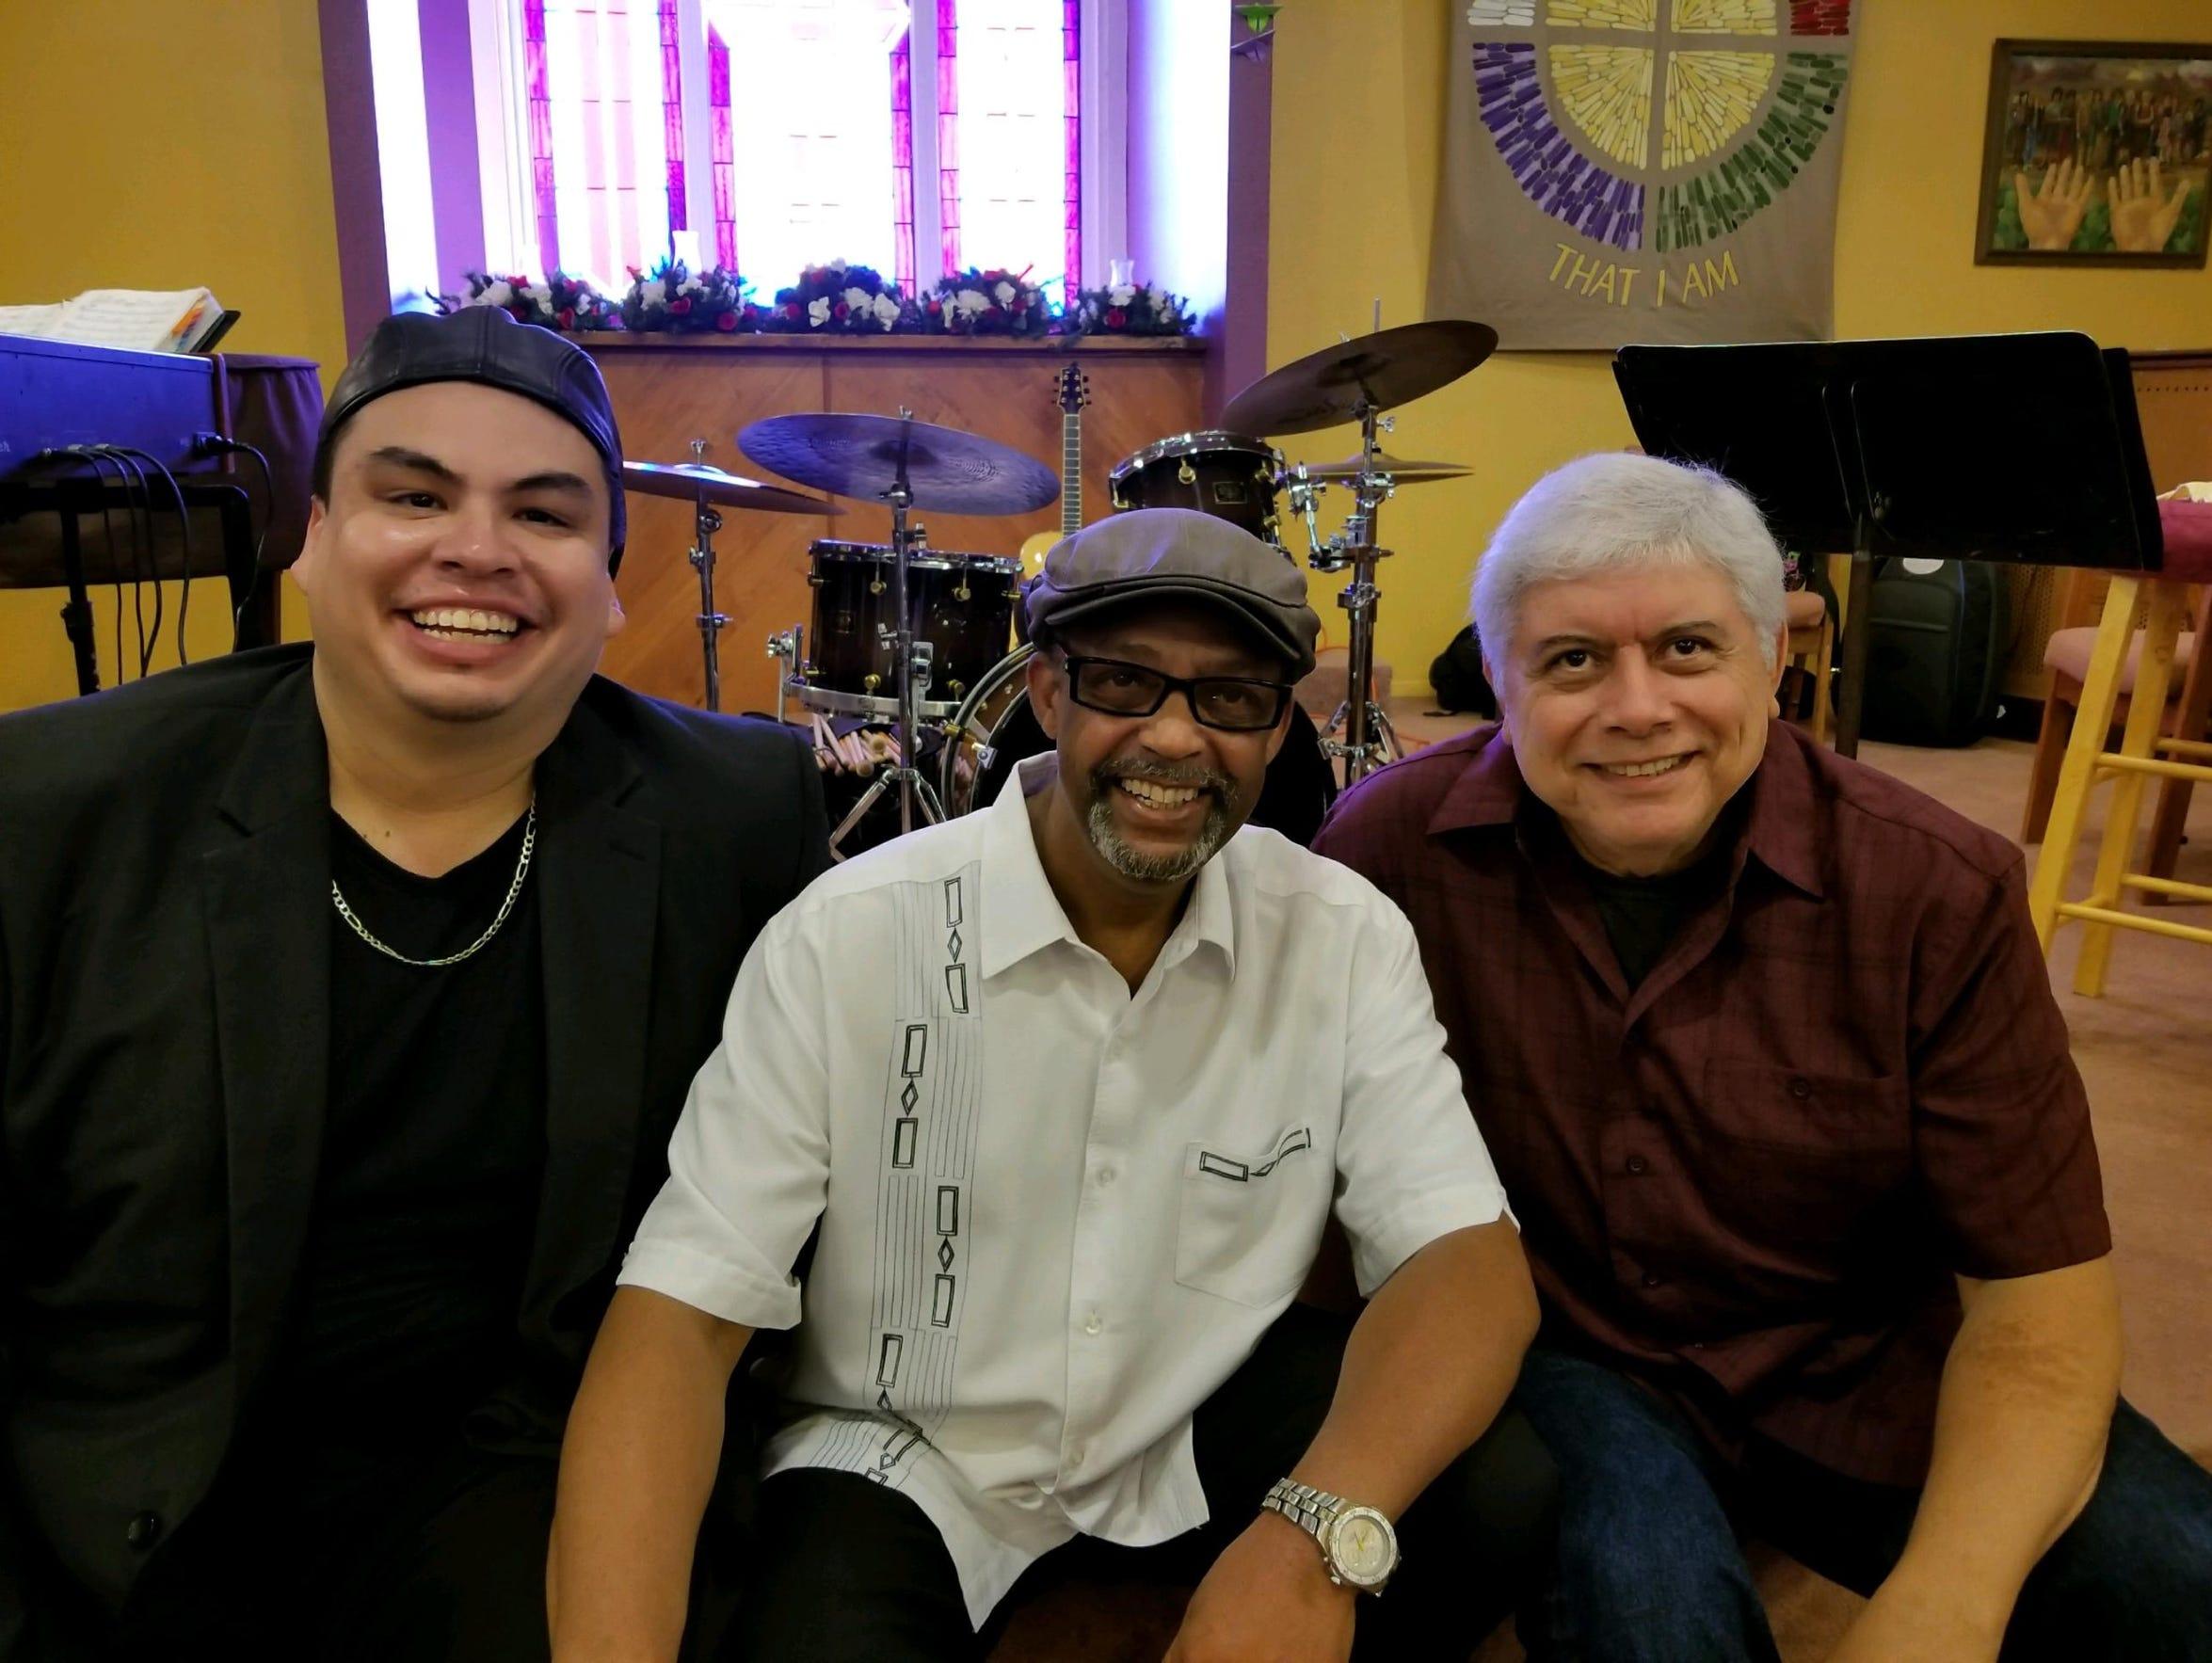 The Side Effect Organ Trio, featuring Dave Borrego